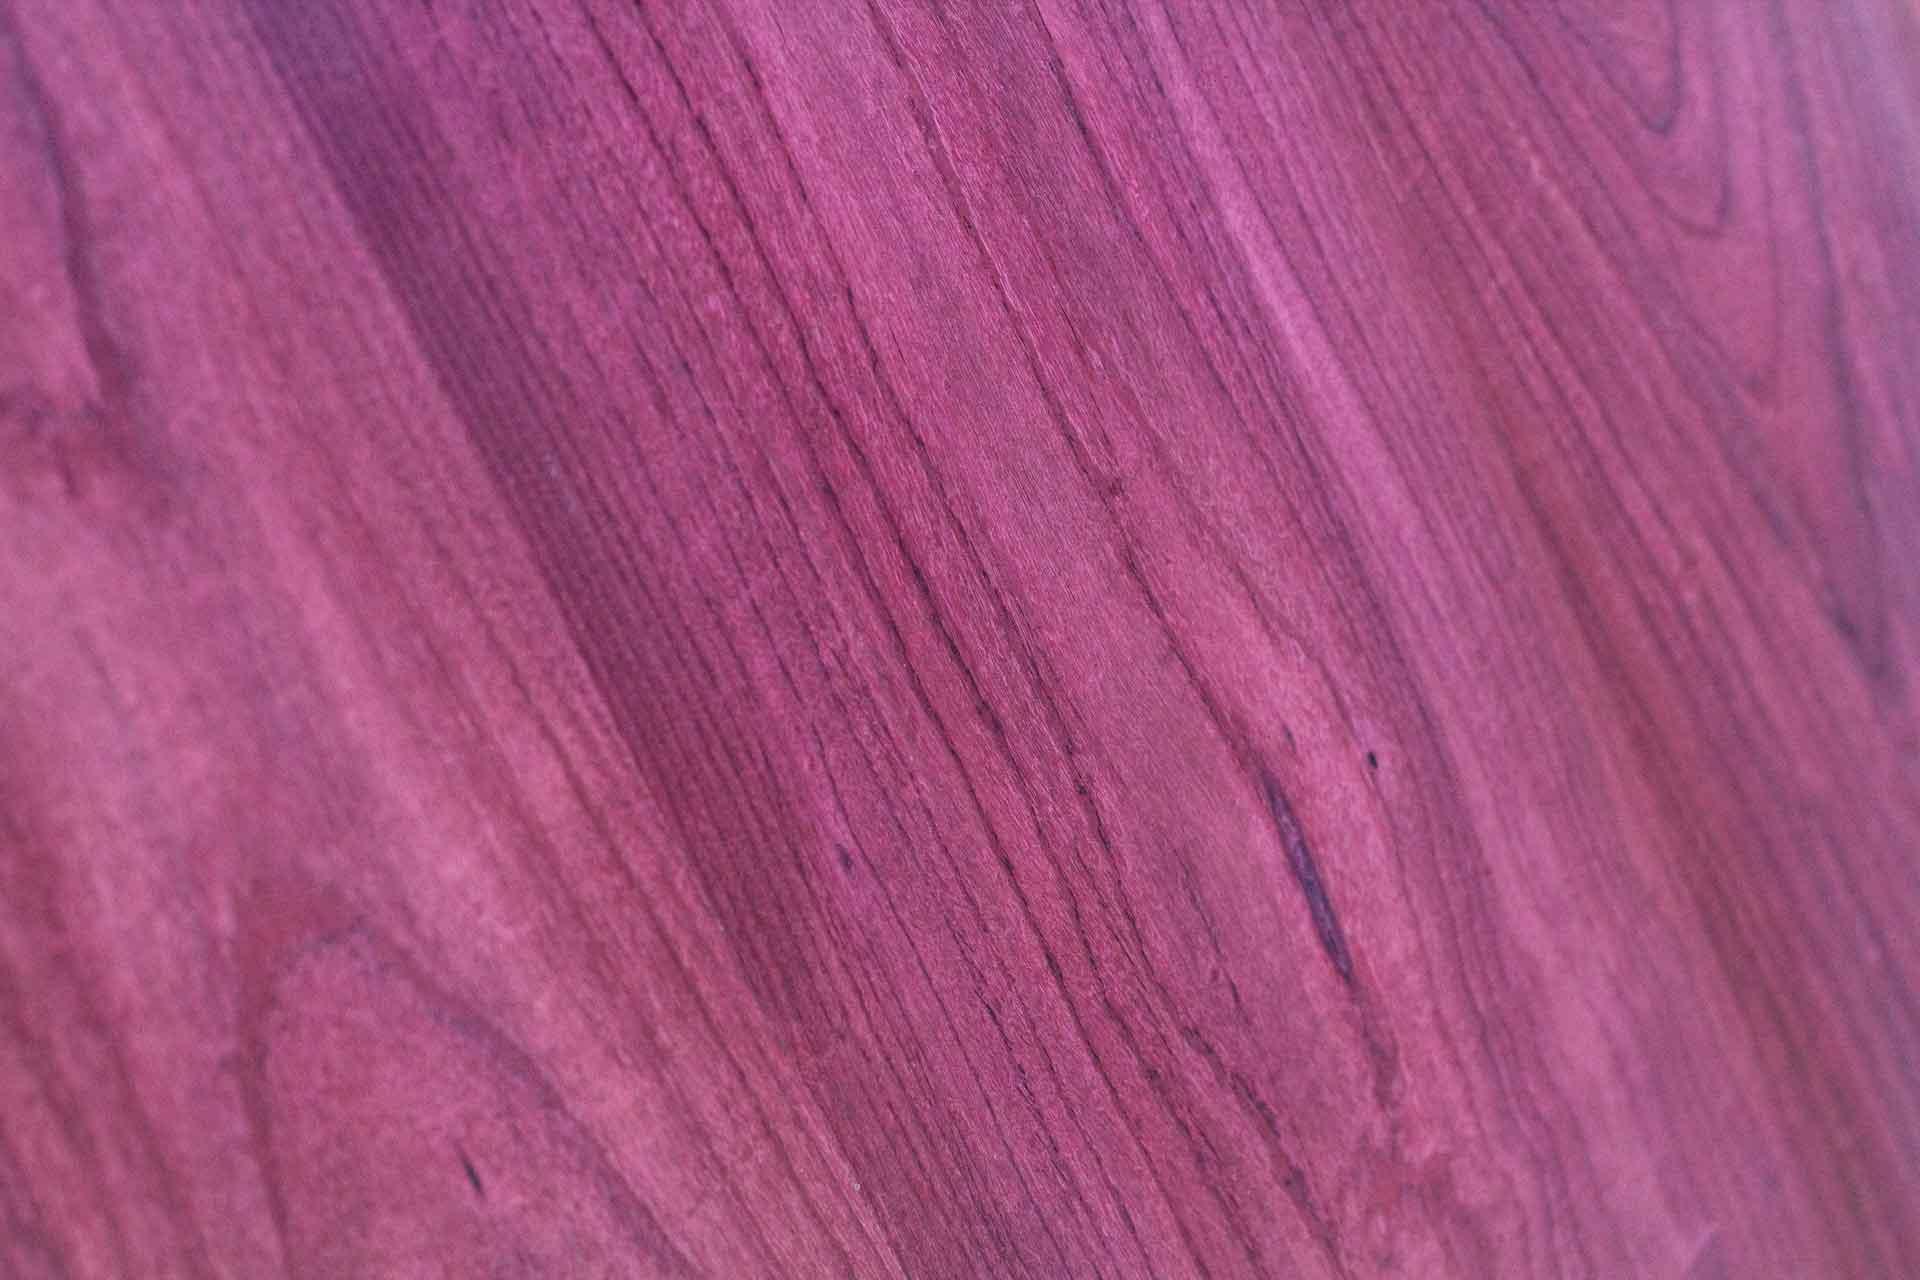 bangles-amaranto_barberini-gunnell-4